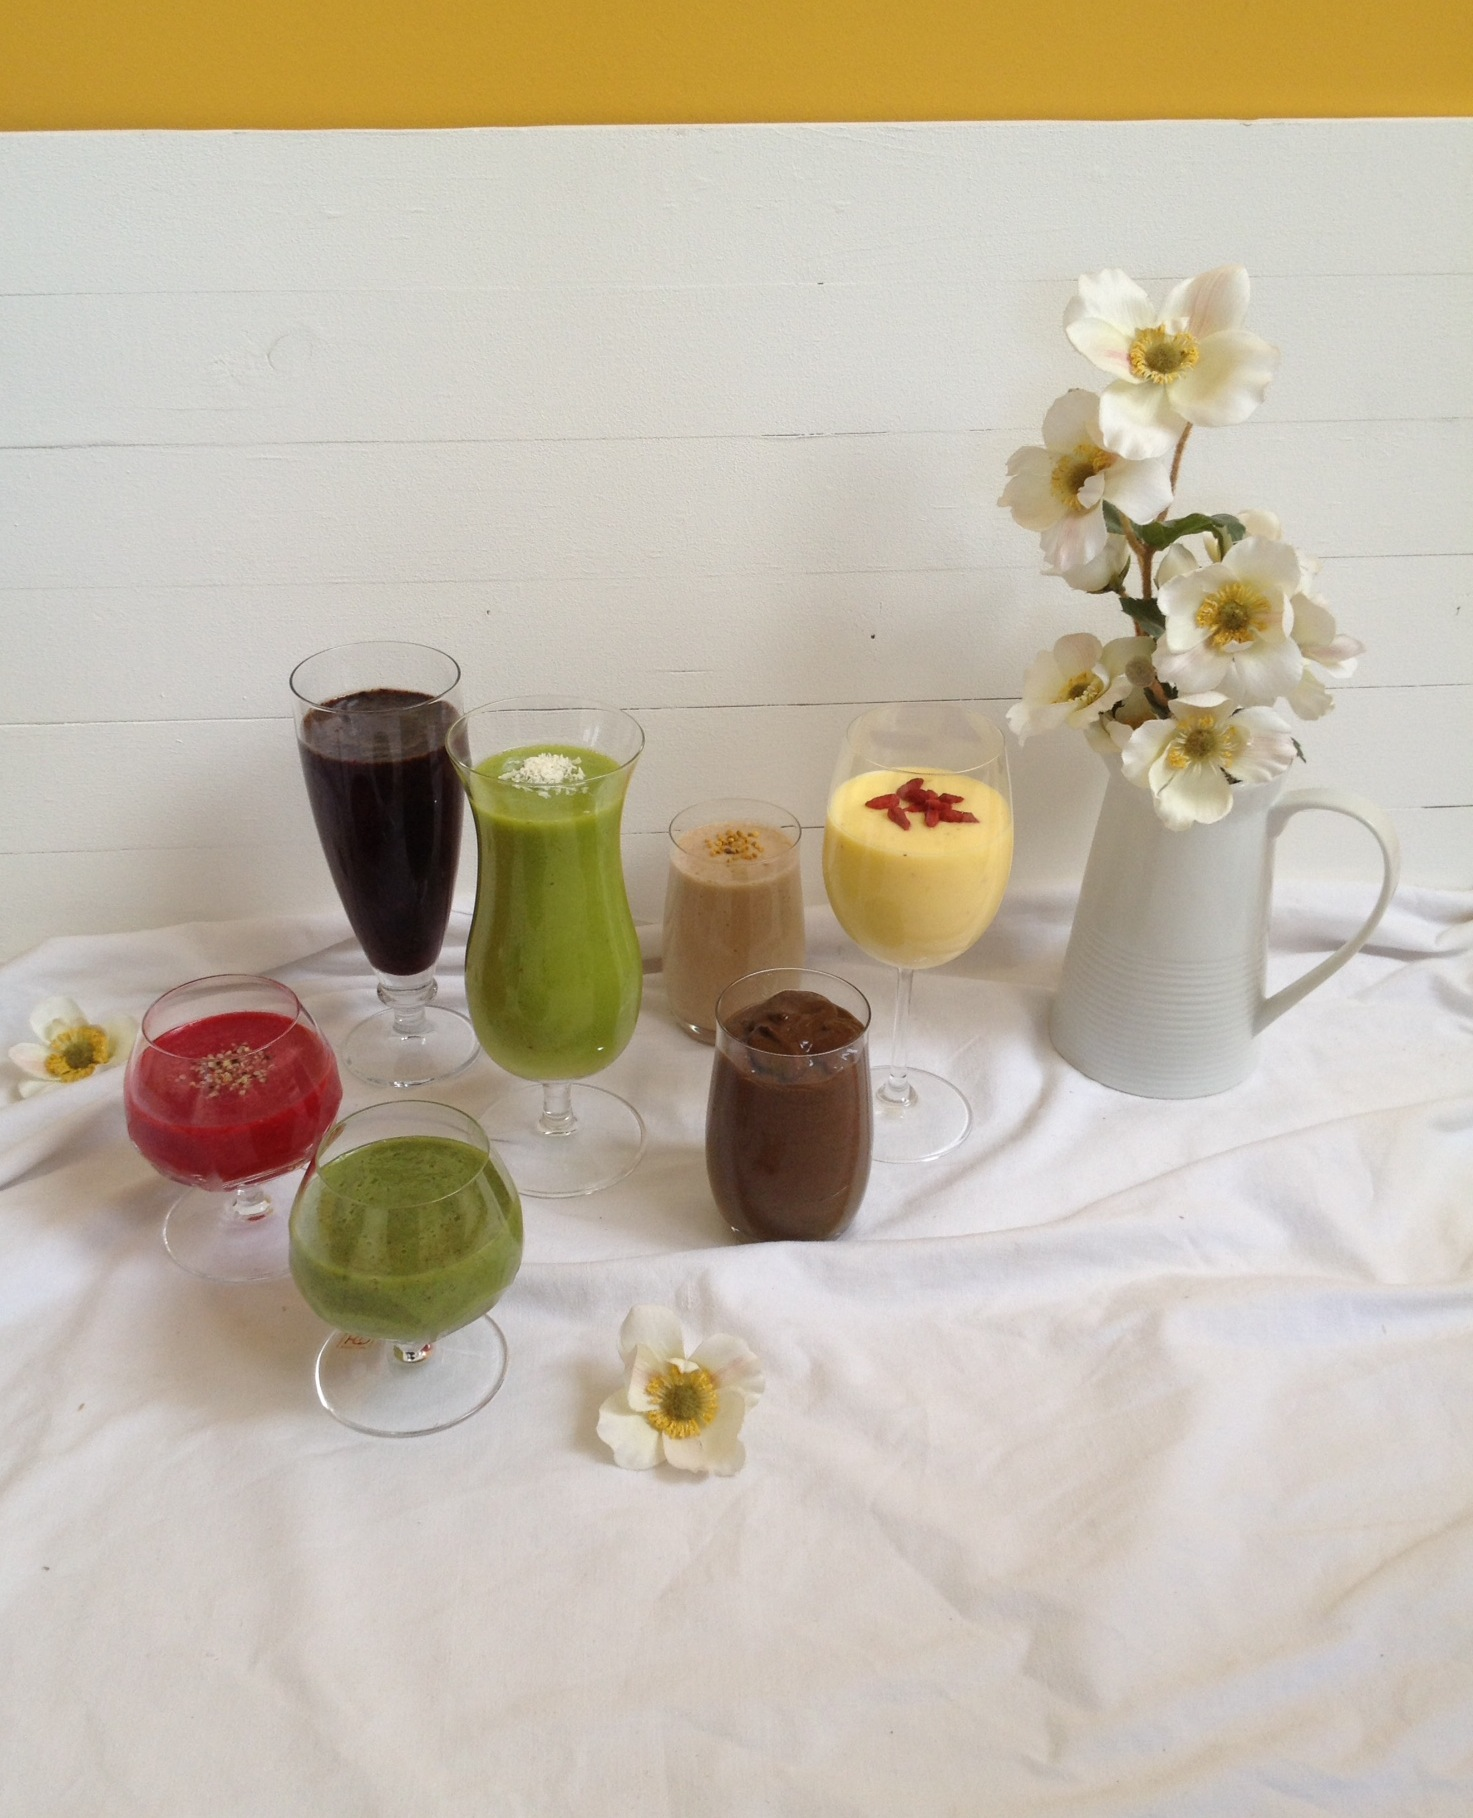 Pisani smoothiji za vse dni vtednu